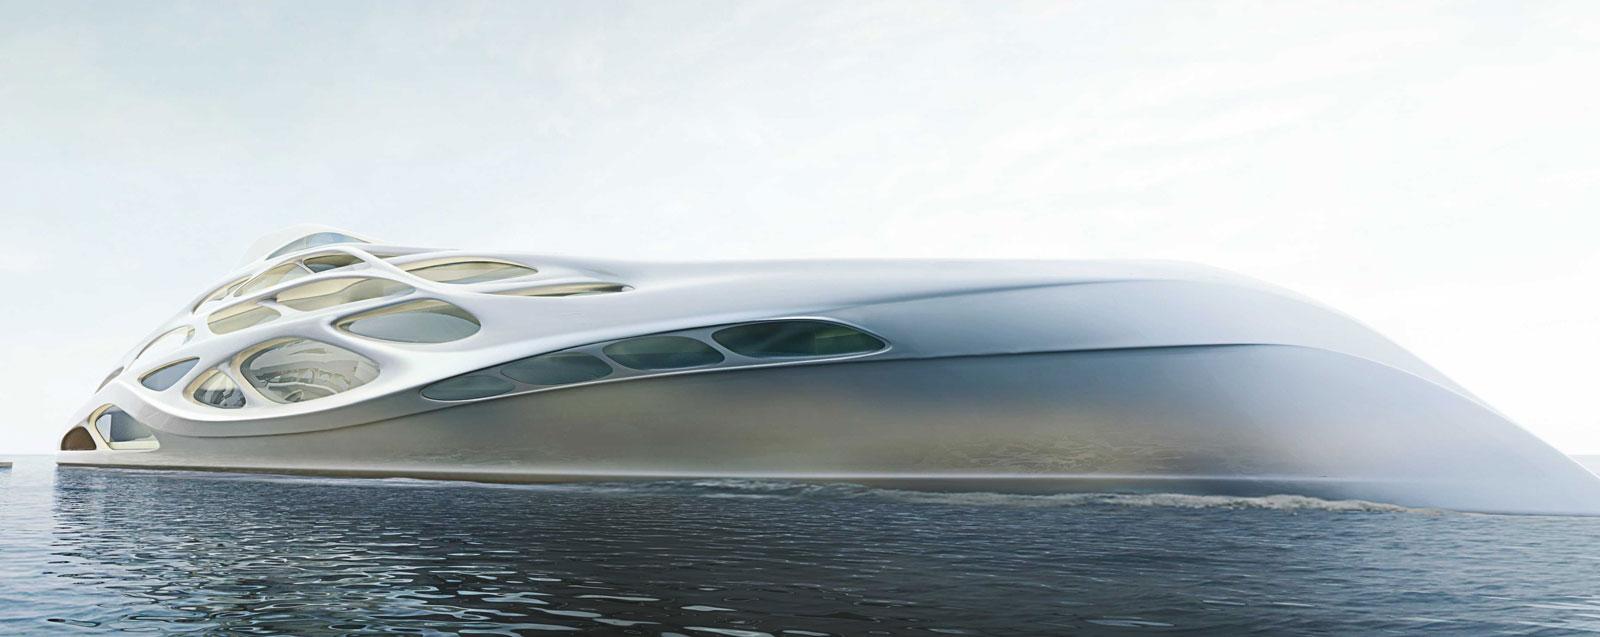 128m Superyacht Concept Master Prototype By Zaha Hadid